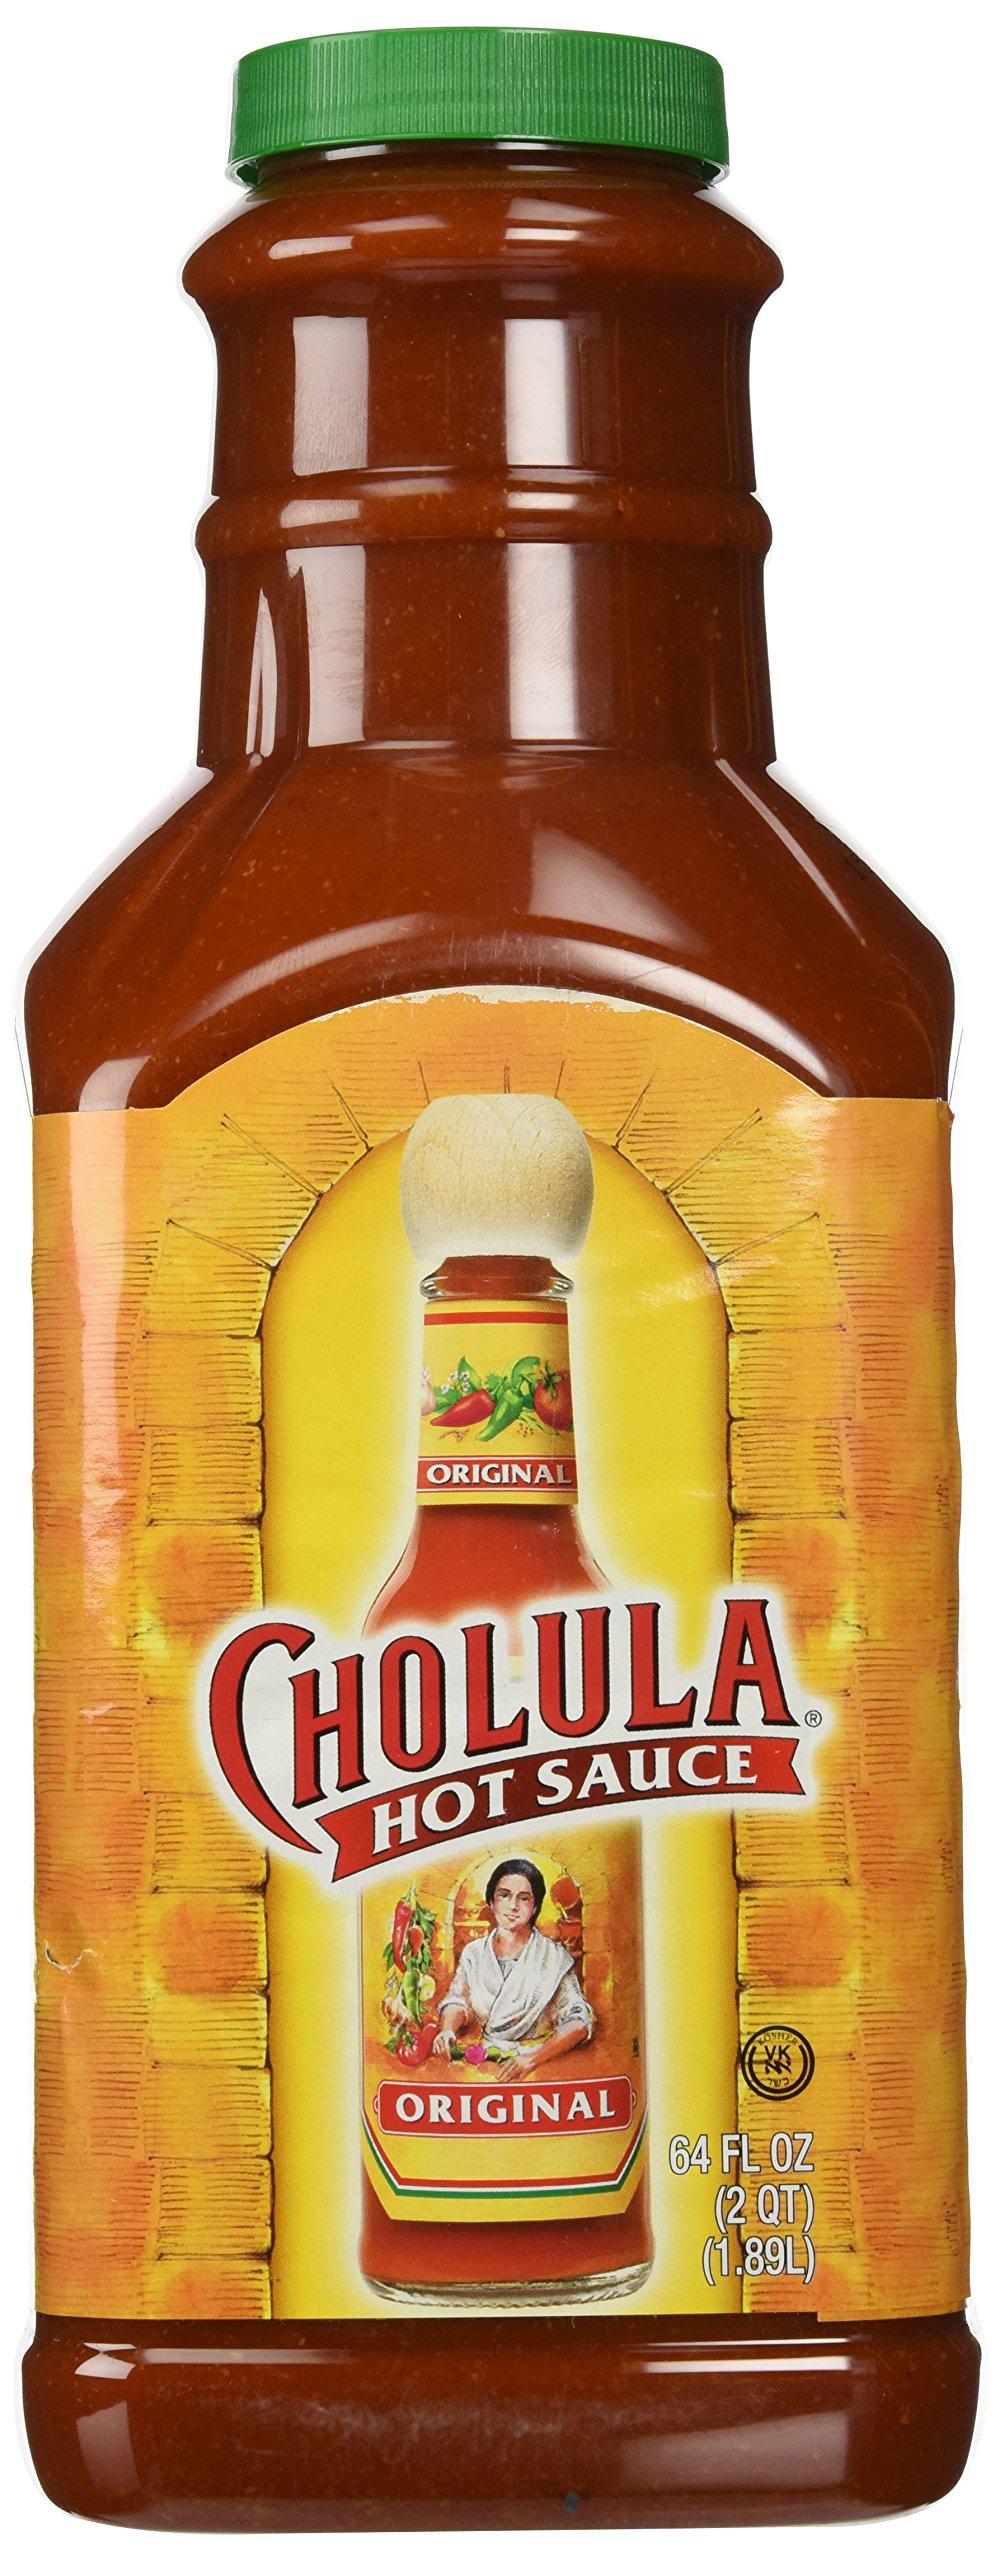 Cholula Original Hot Sauce 1/2 Gallon, 64oz. by Cholula [Foods]